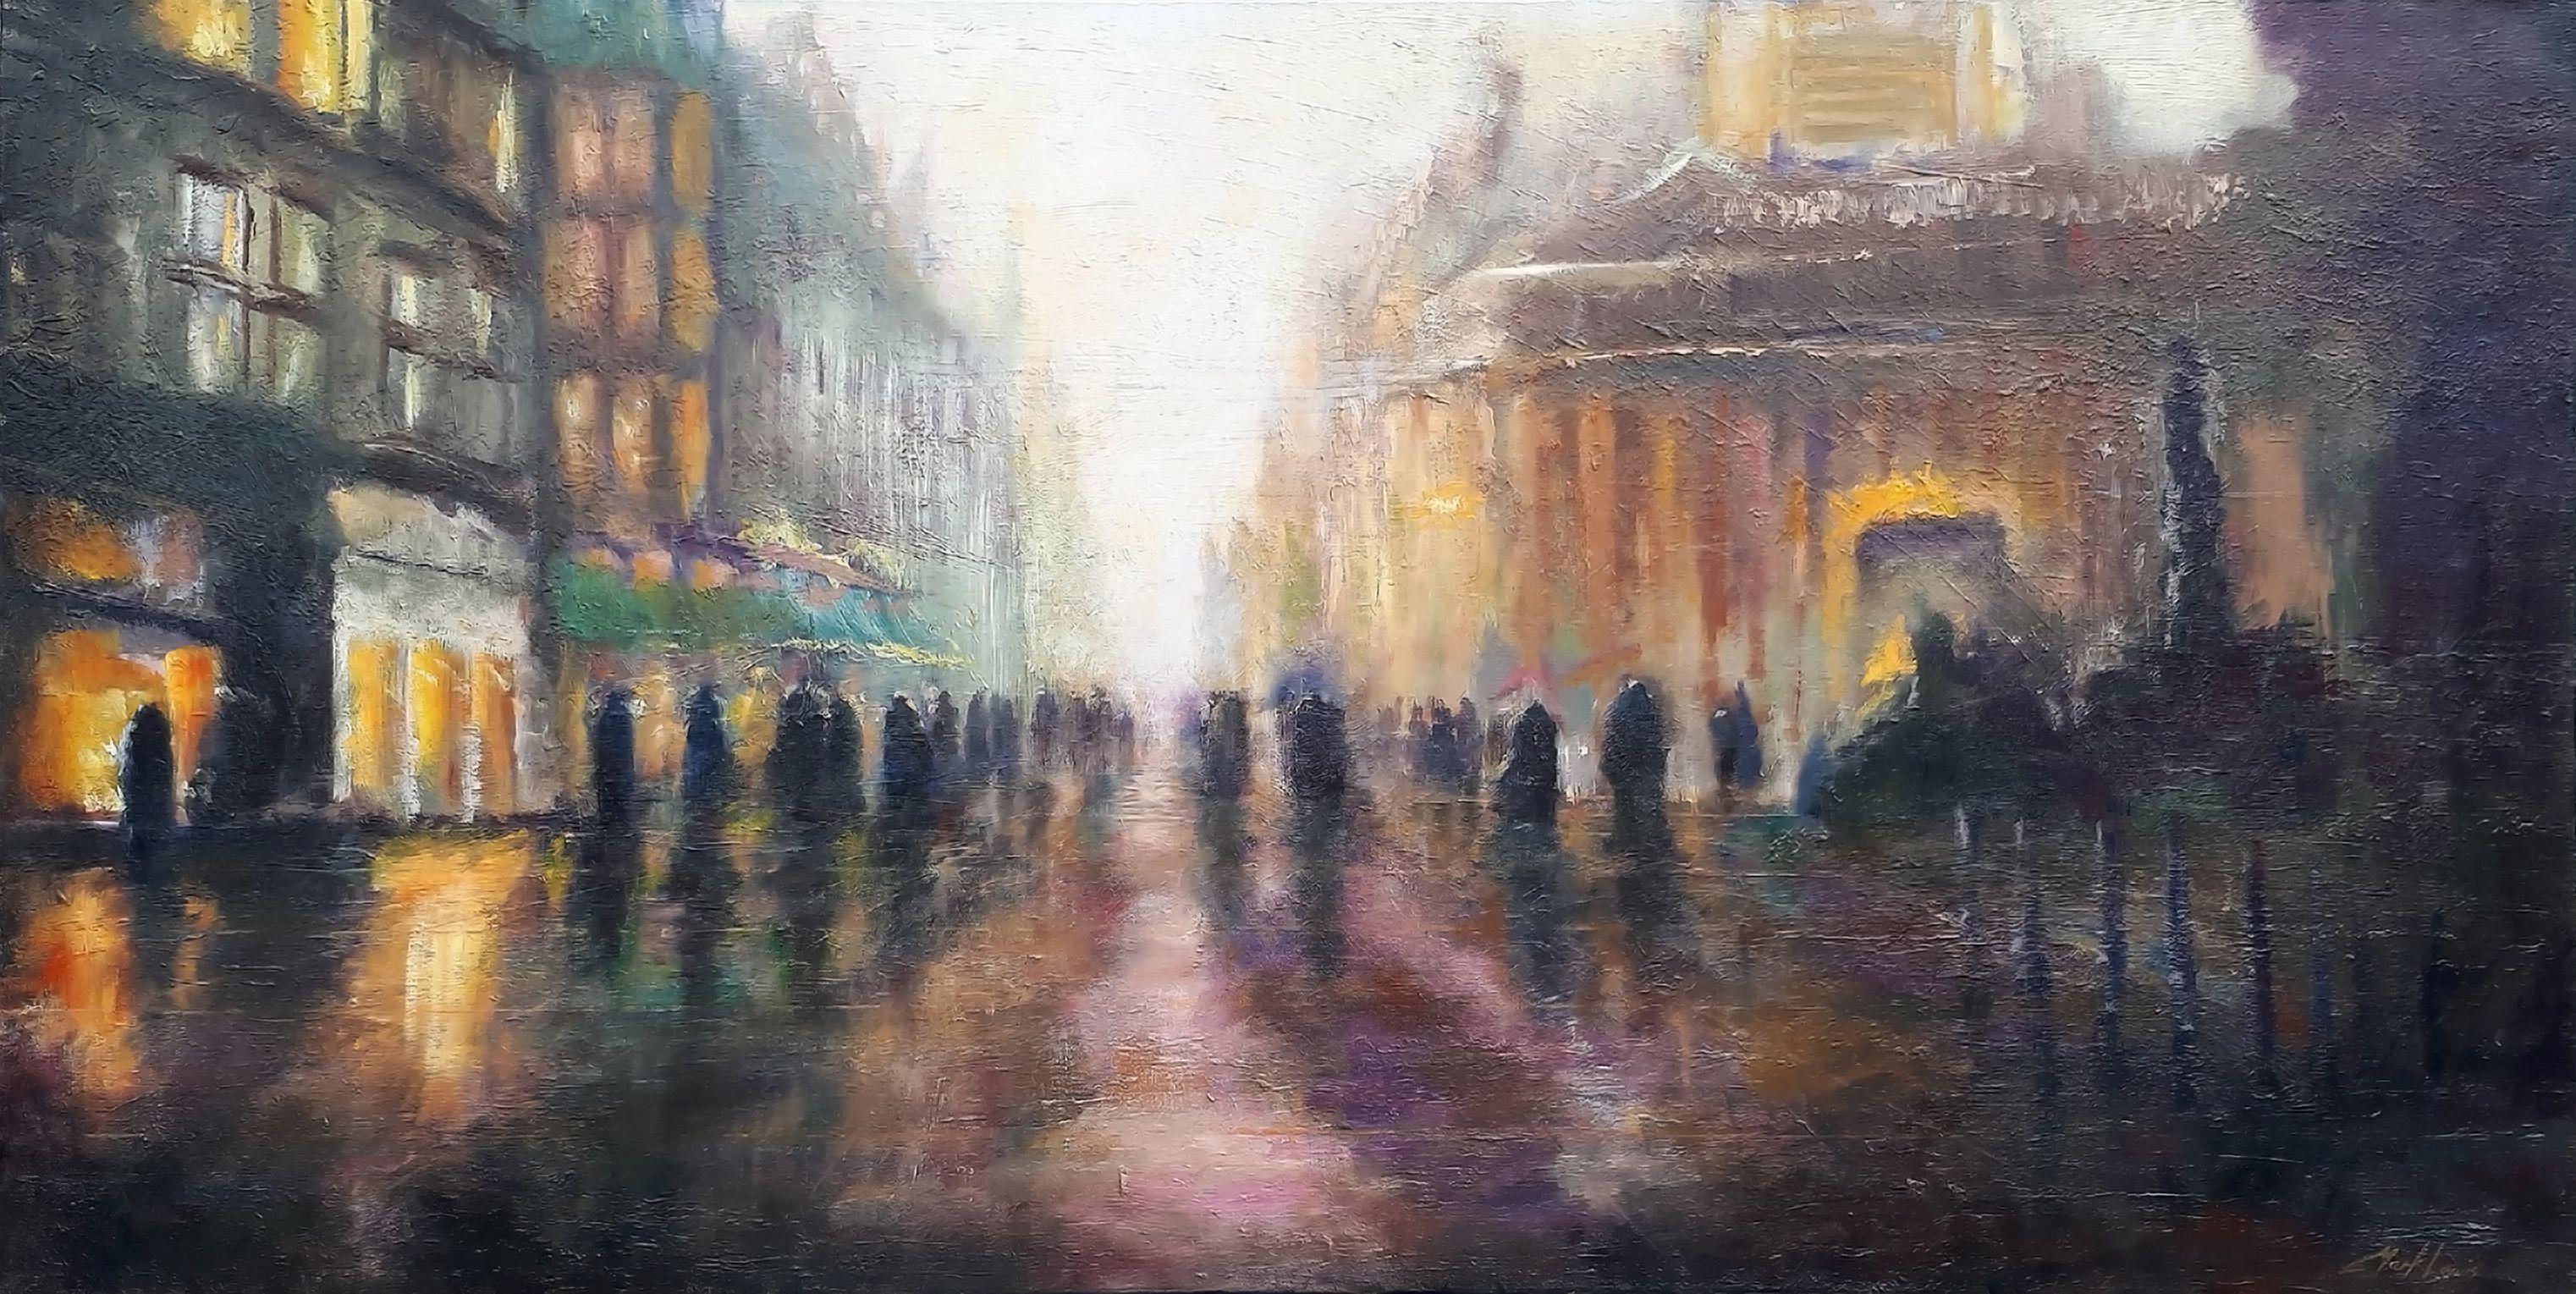 Buchanan Street, Glasgow, Painting, Oil on Canvas